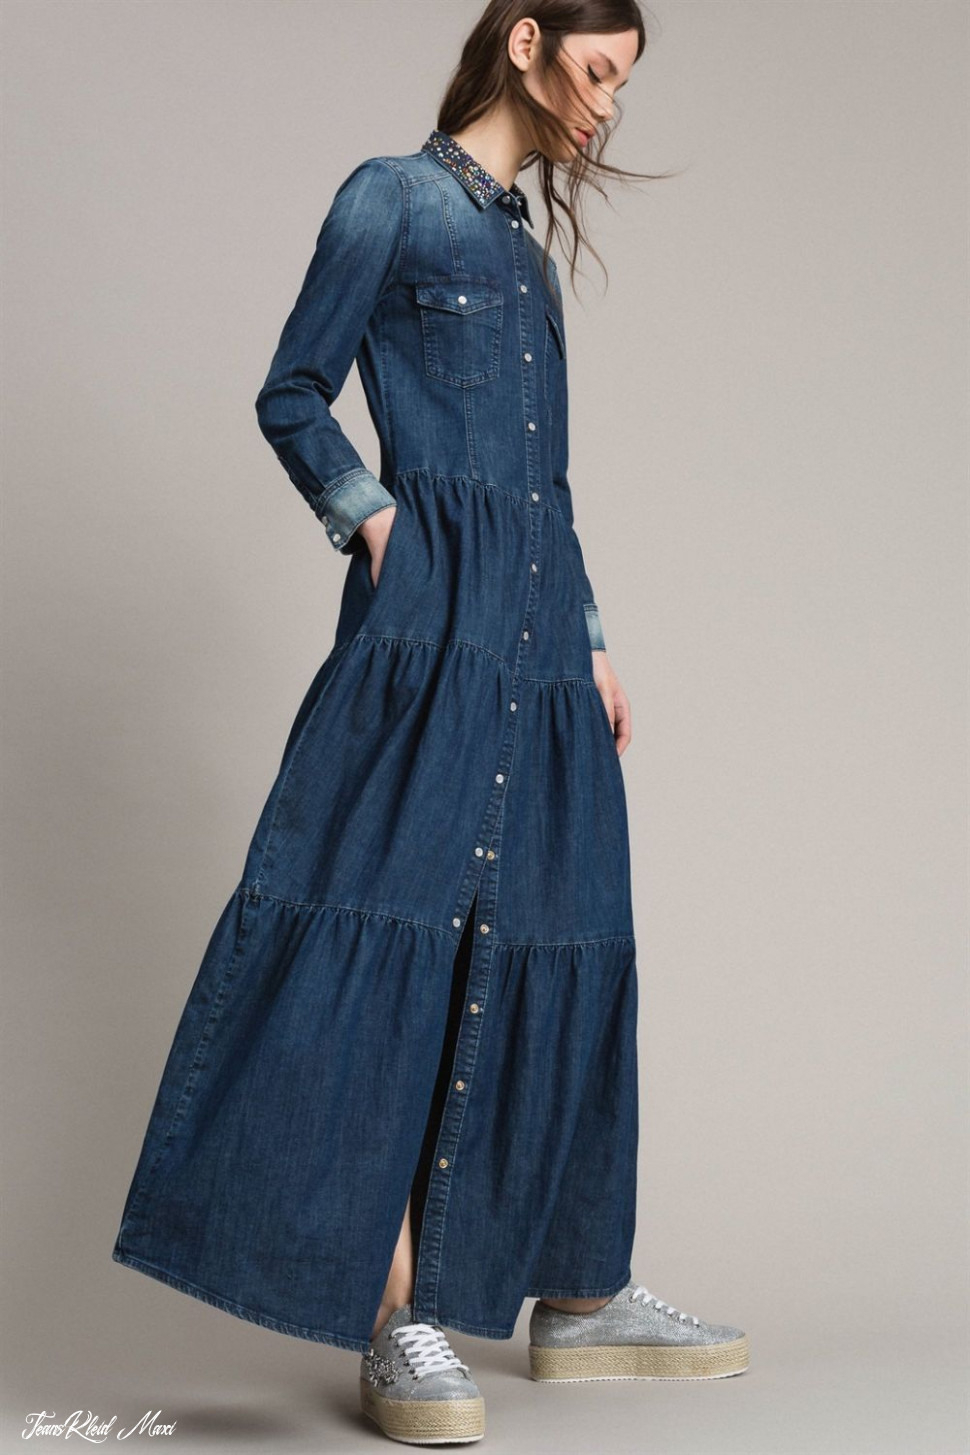 Jeans Kleid Maxi  Abendkleider